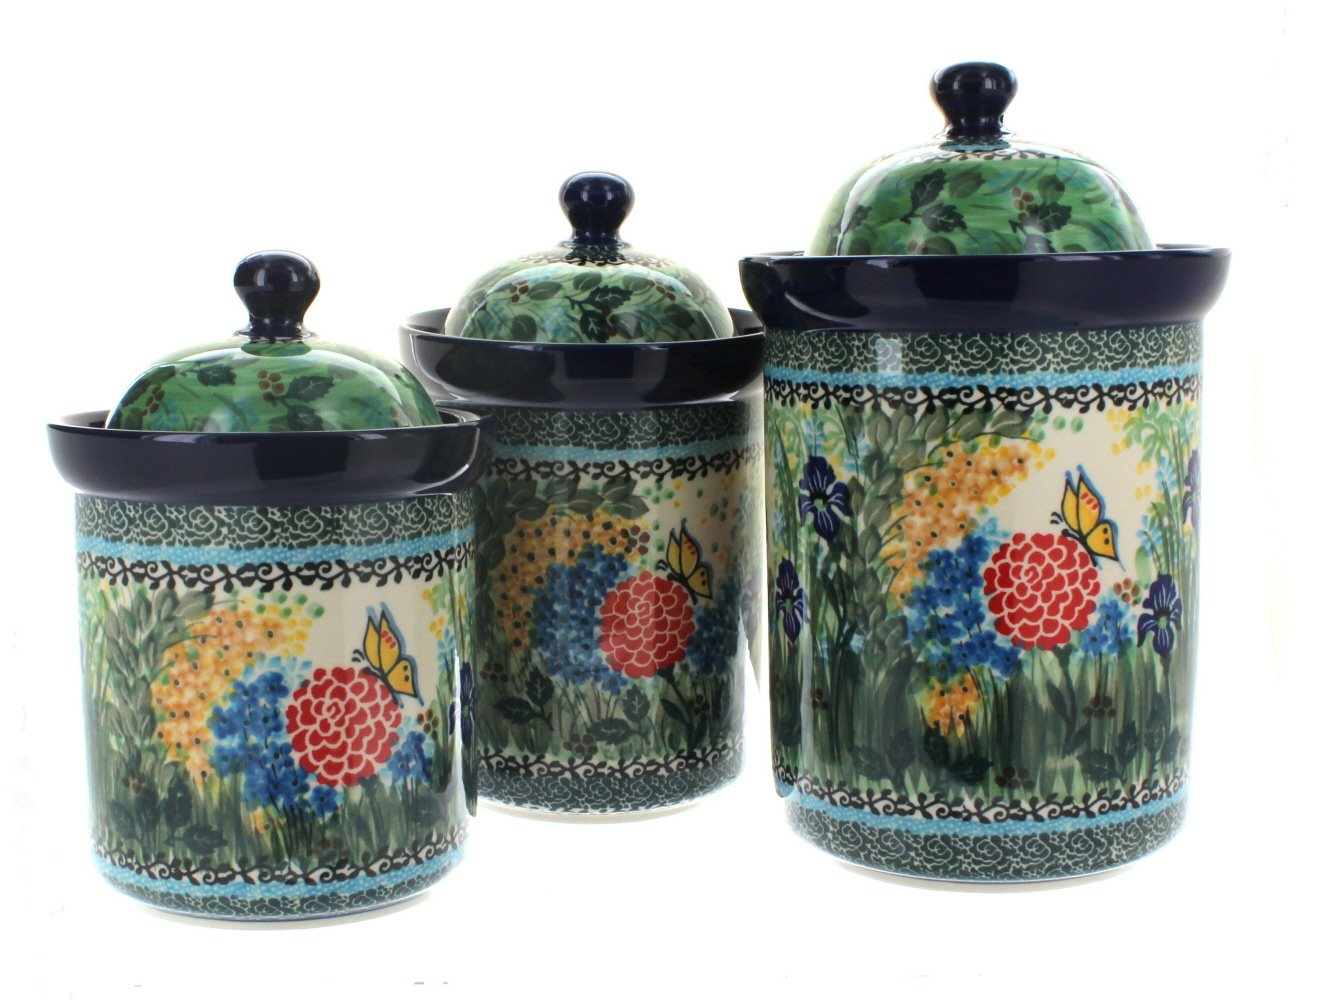 Polish Pottery Teresa 3 Piece Canister Set